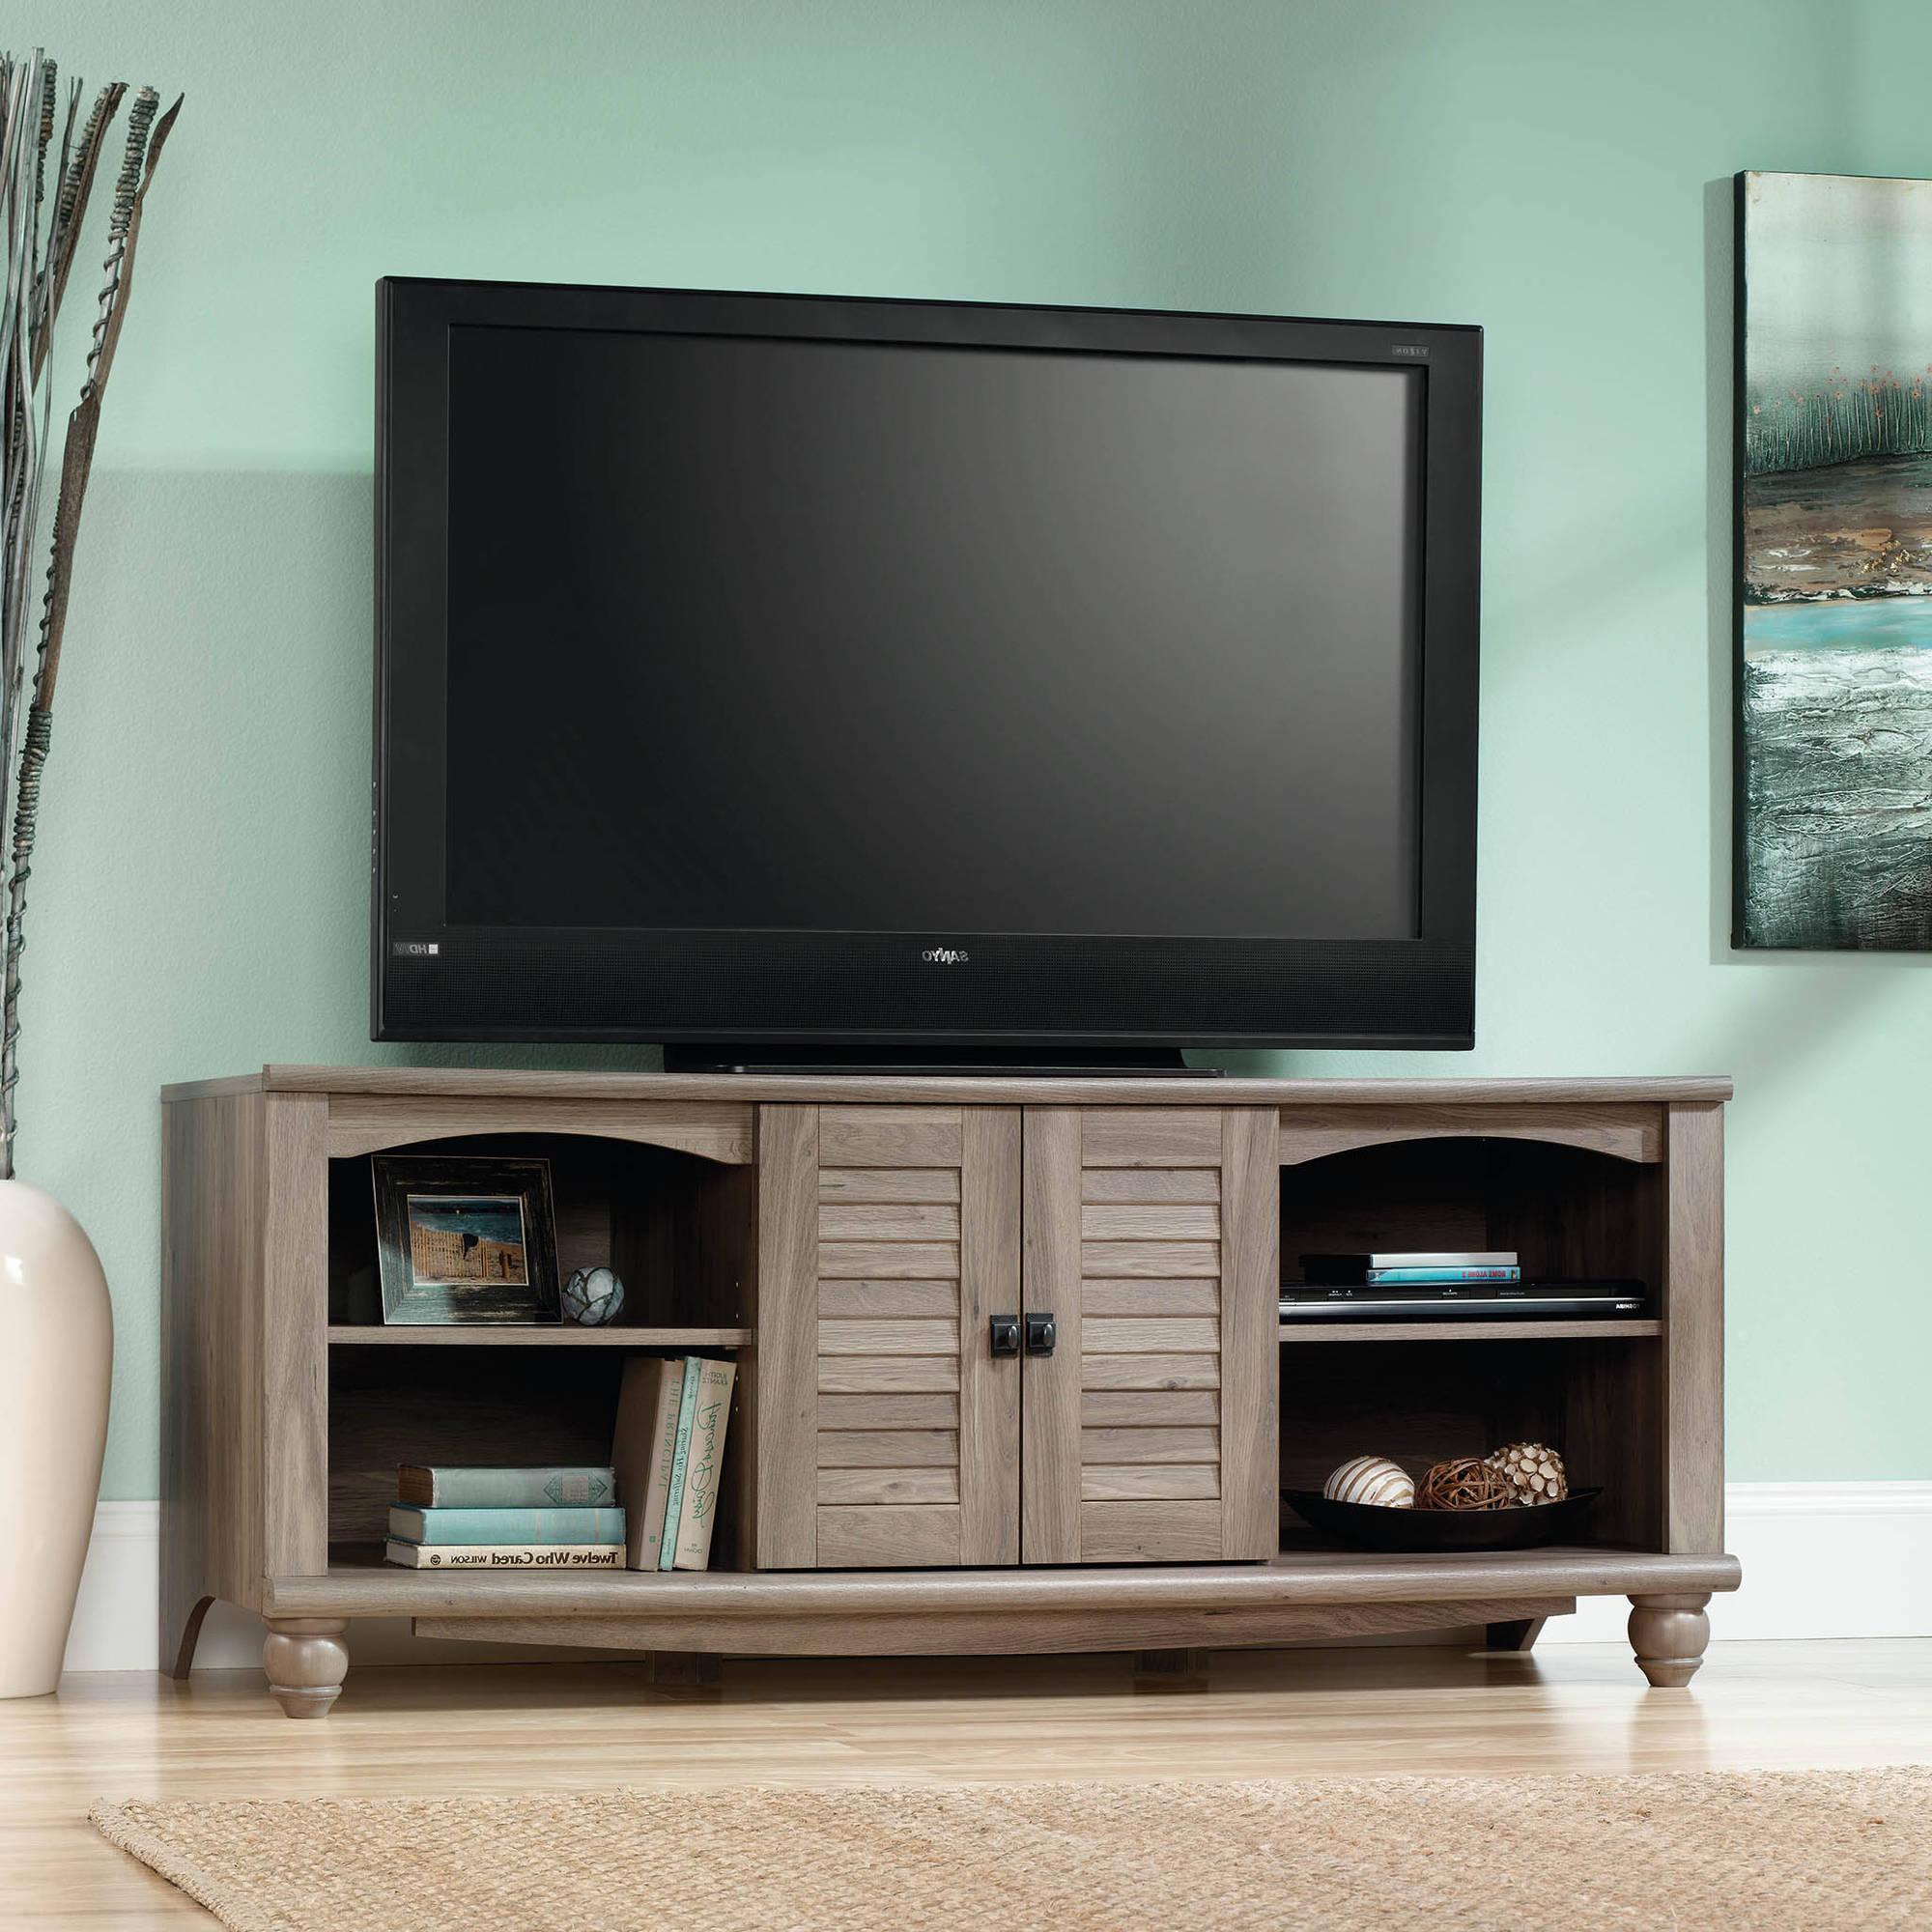 Sauder Shoal Creek Collection Nightstand, Oiled Oak – Walmart Regarding Wakefield 85 Inch Tv Stands (View 17 of 20)